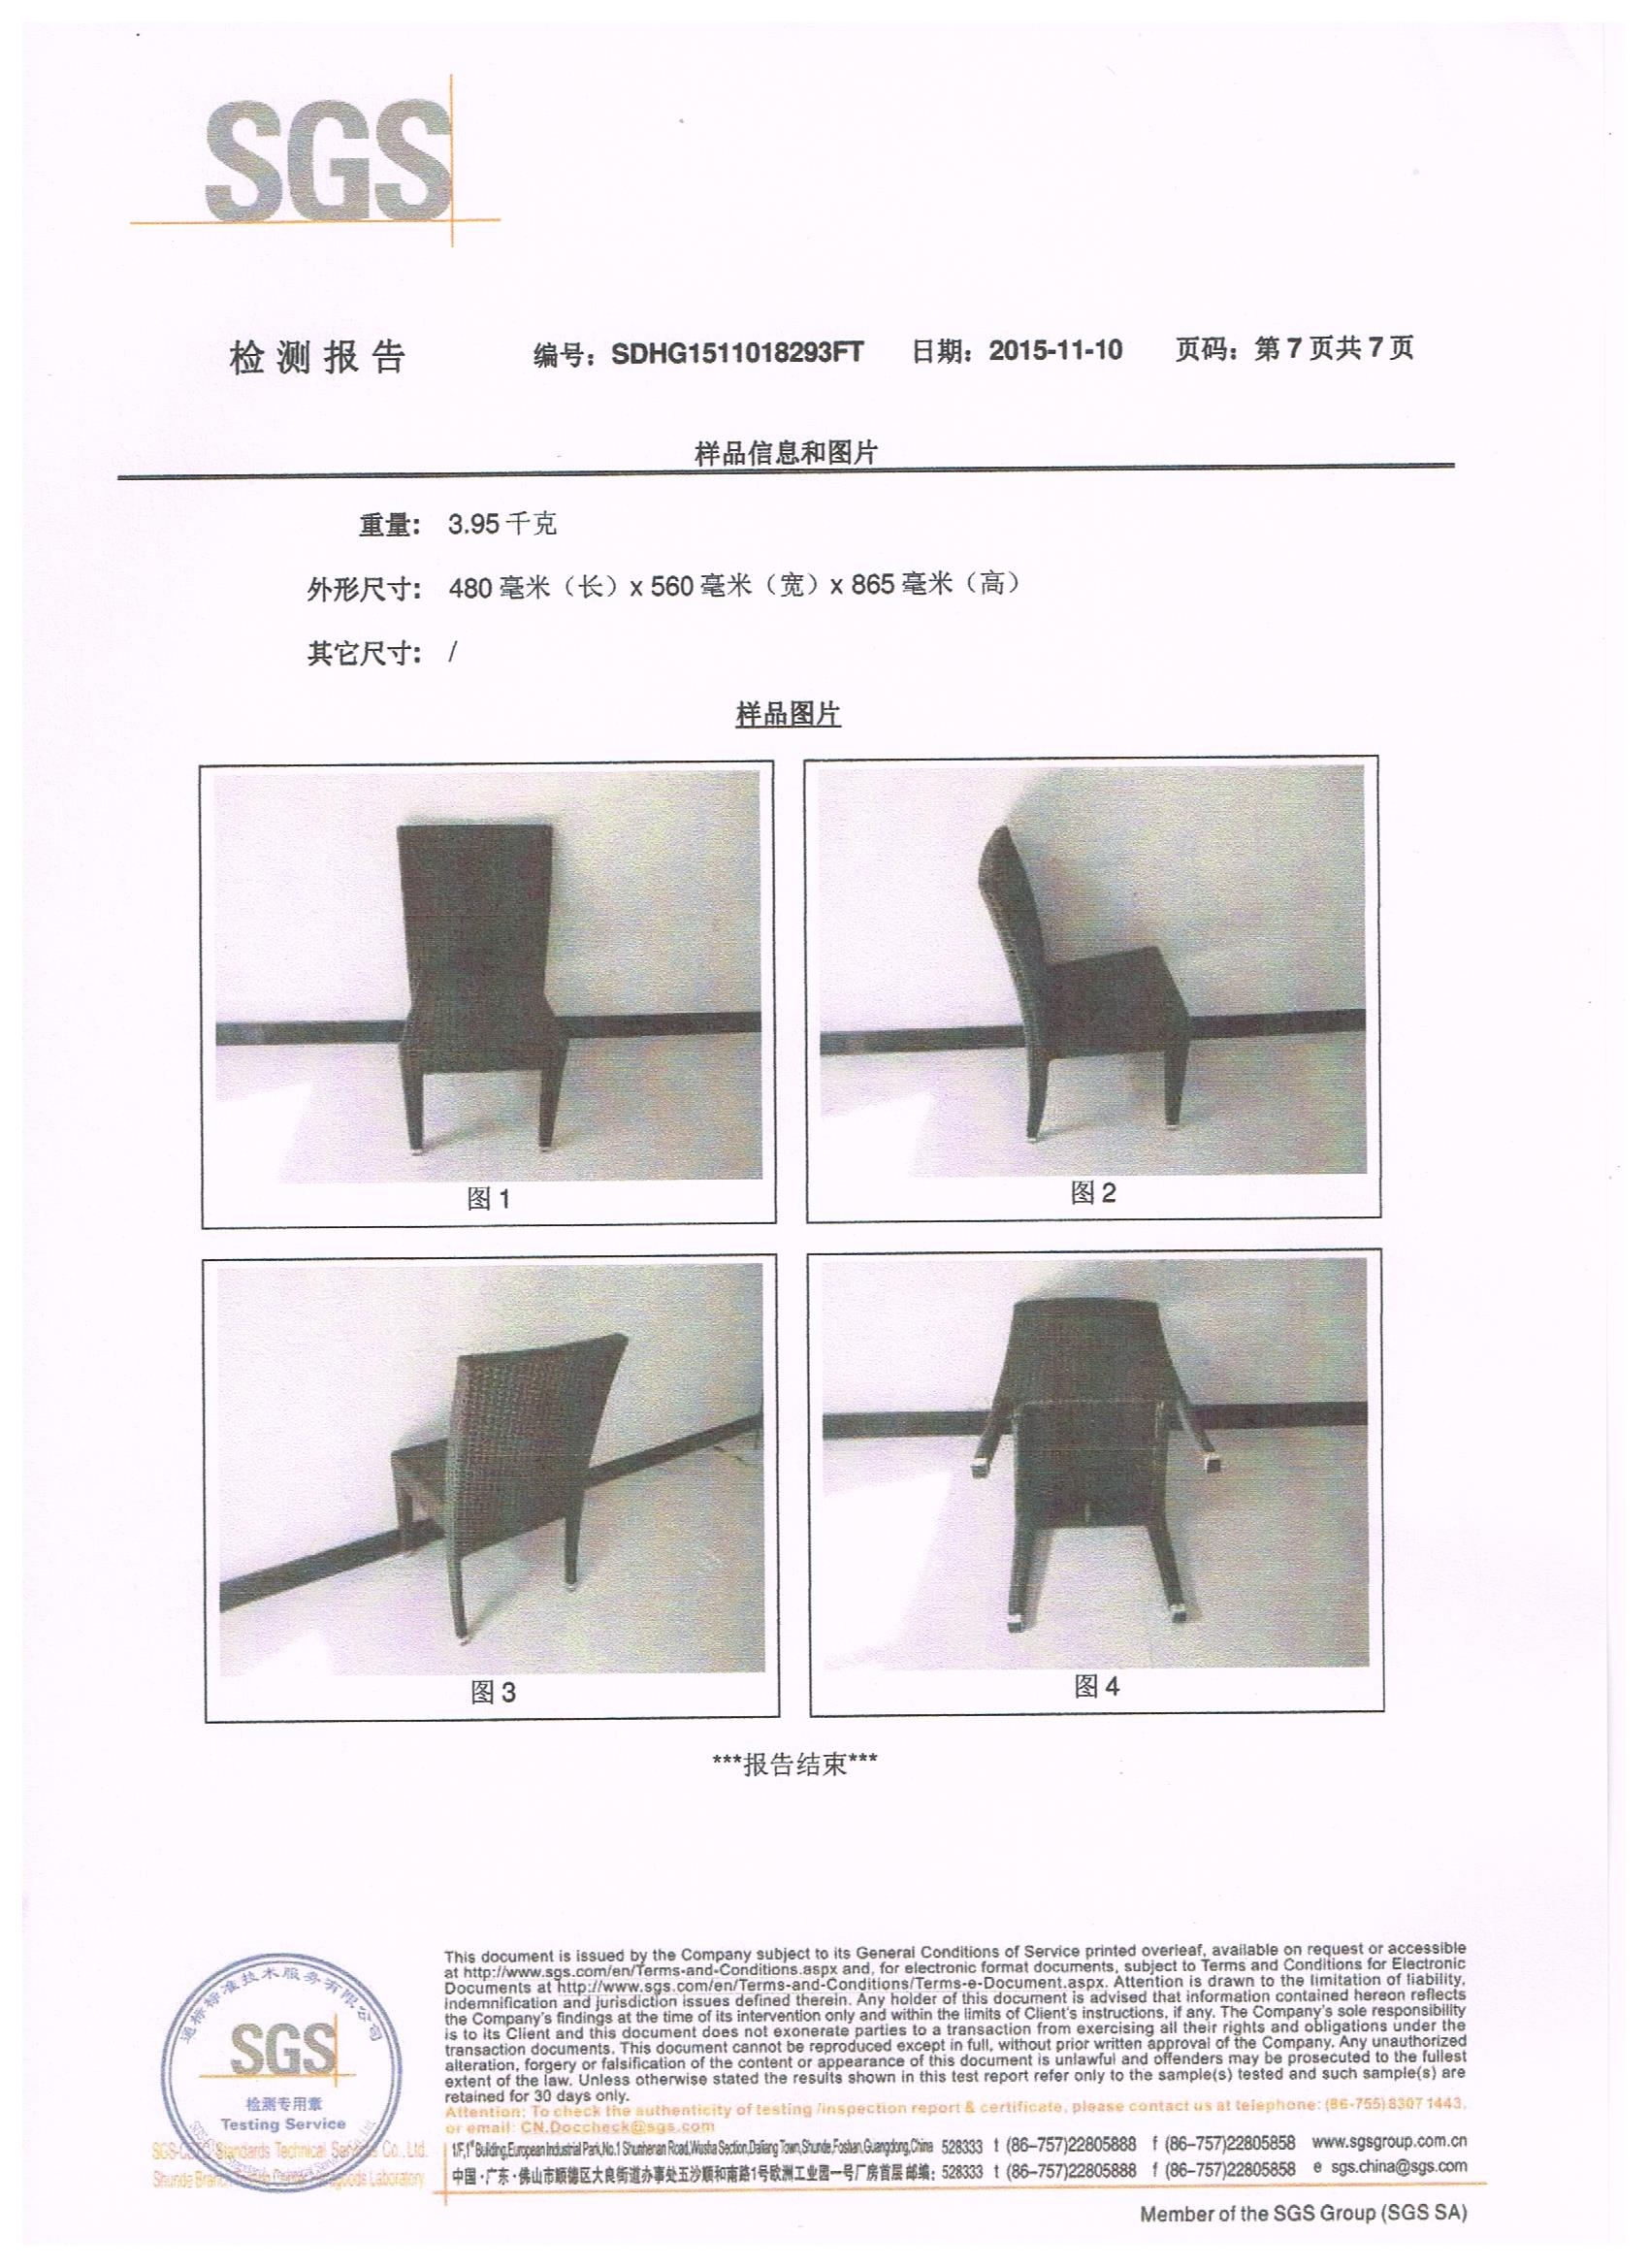 SGS测试中文报告007